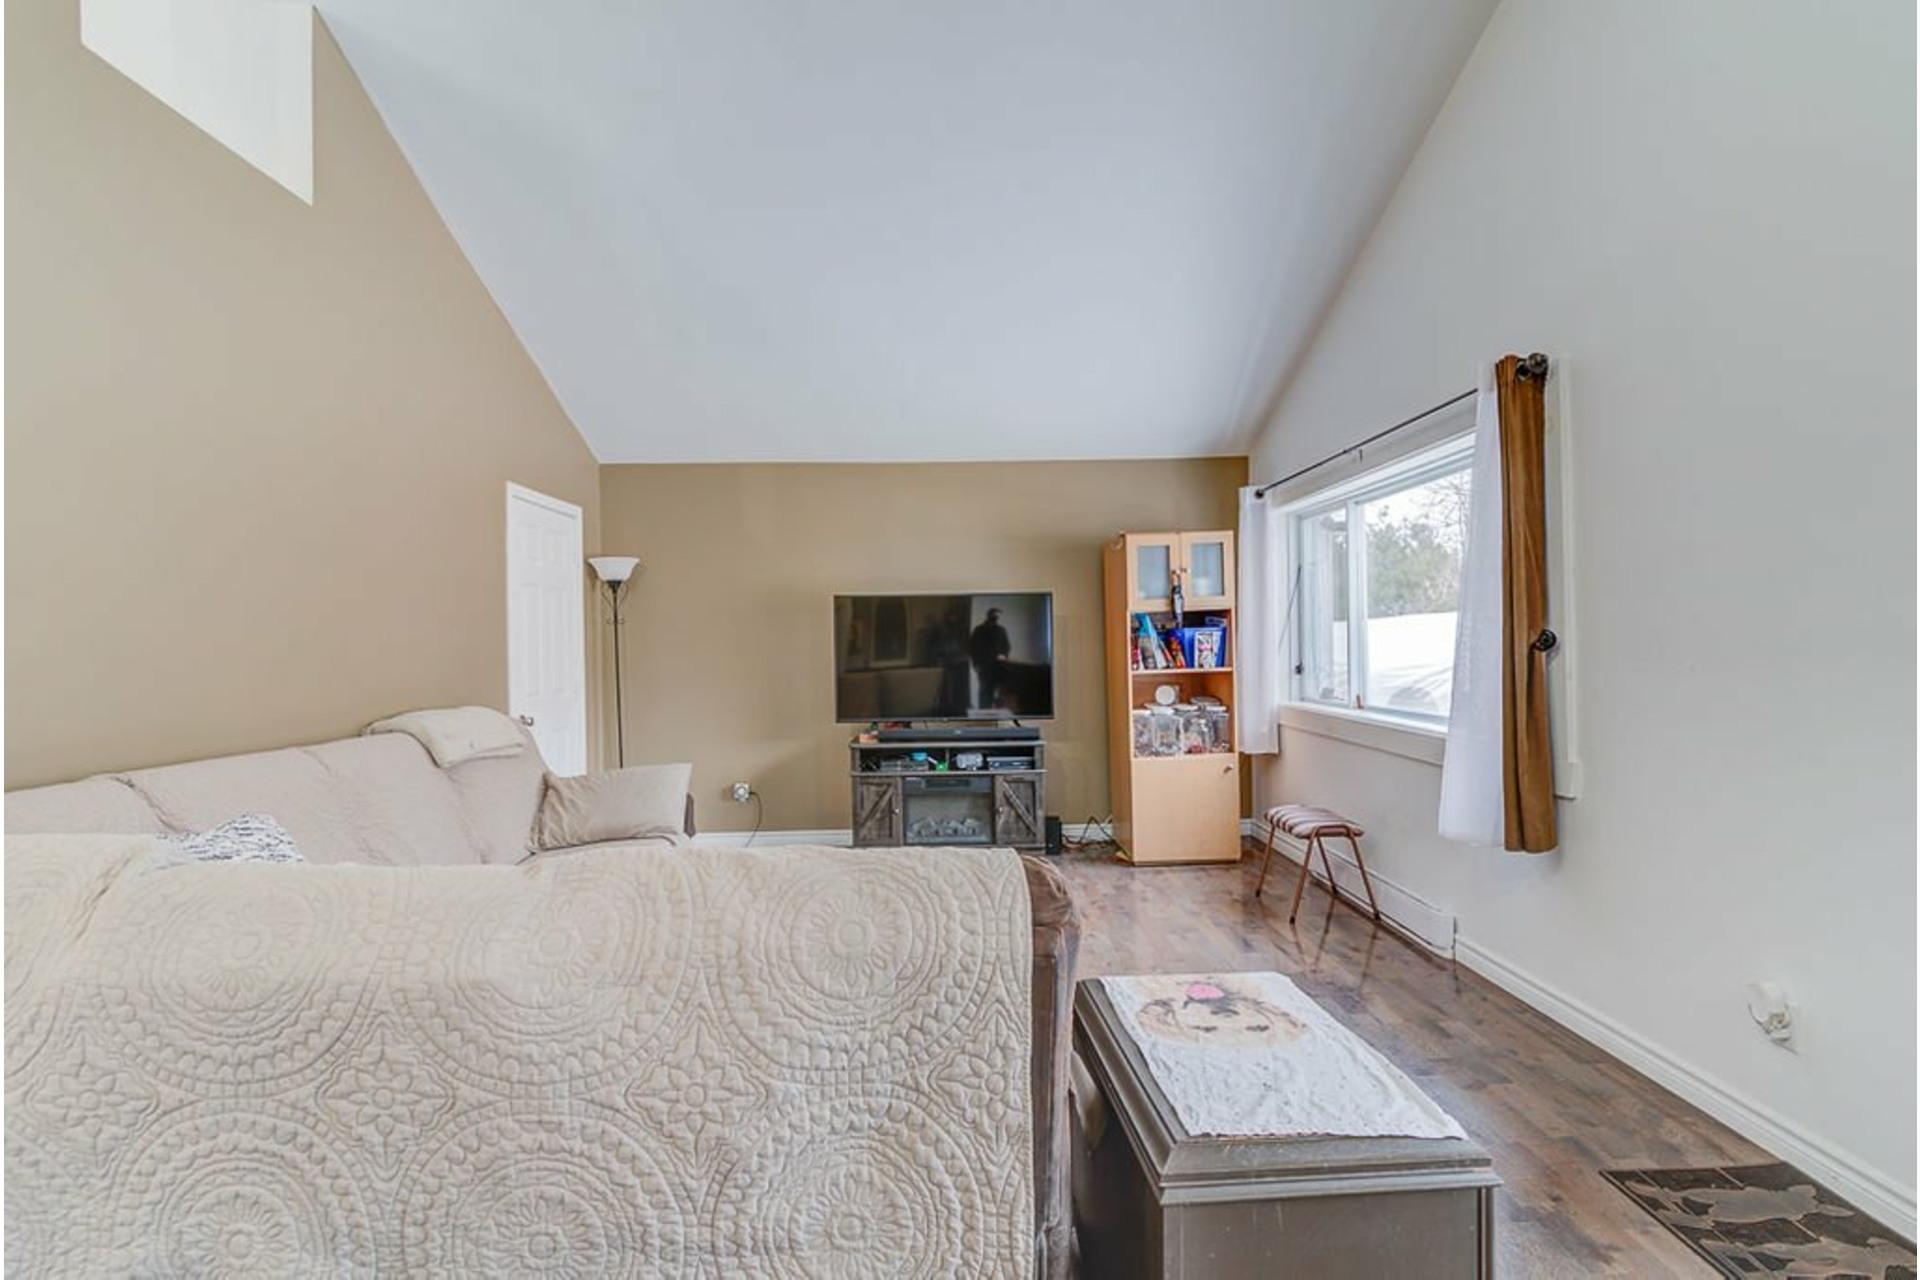 image 5 - House For sale Sainte-Julienne - 7 rooms